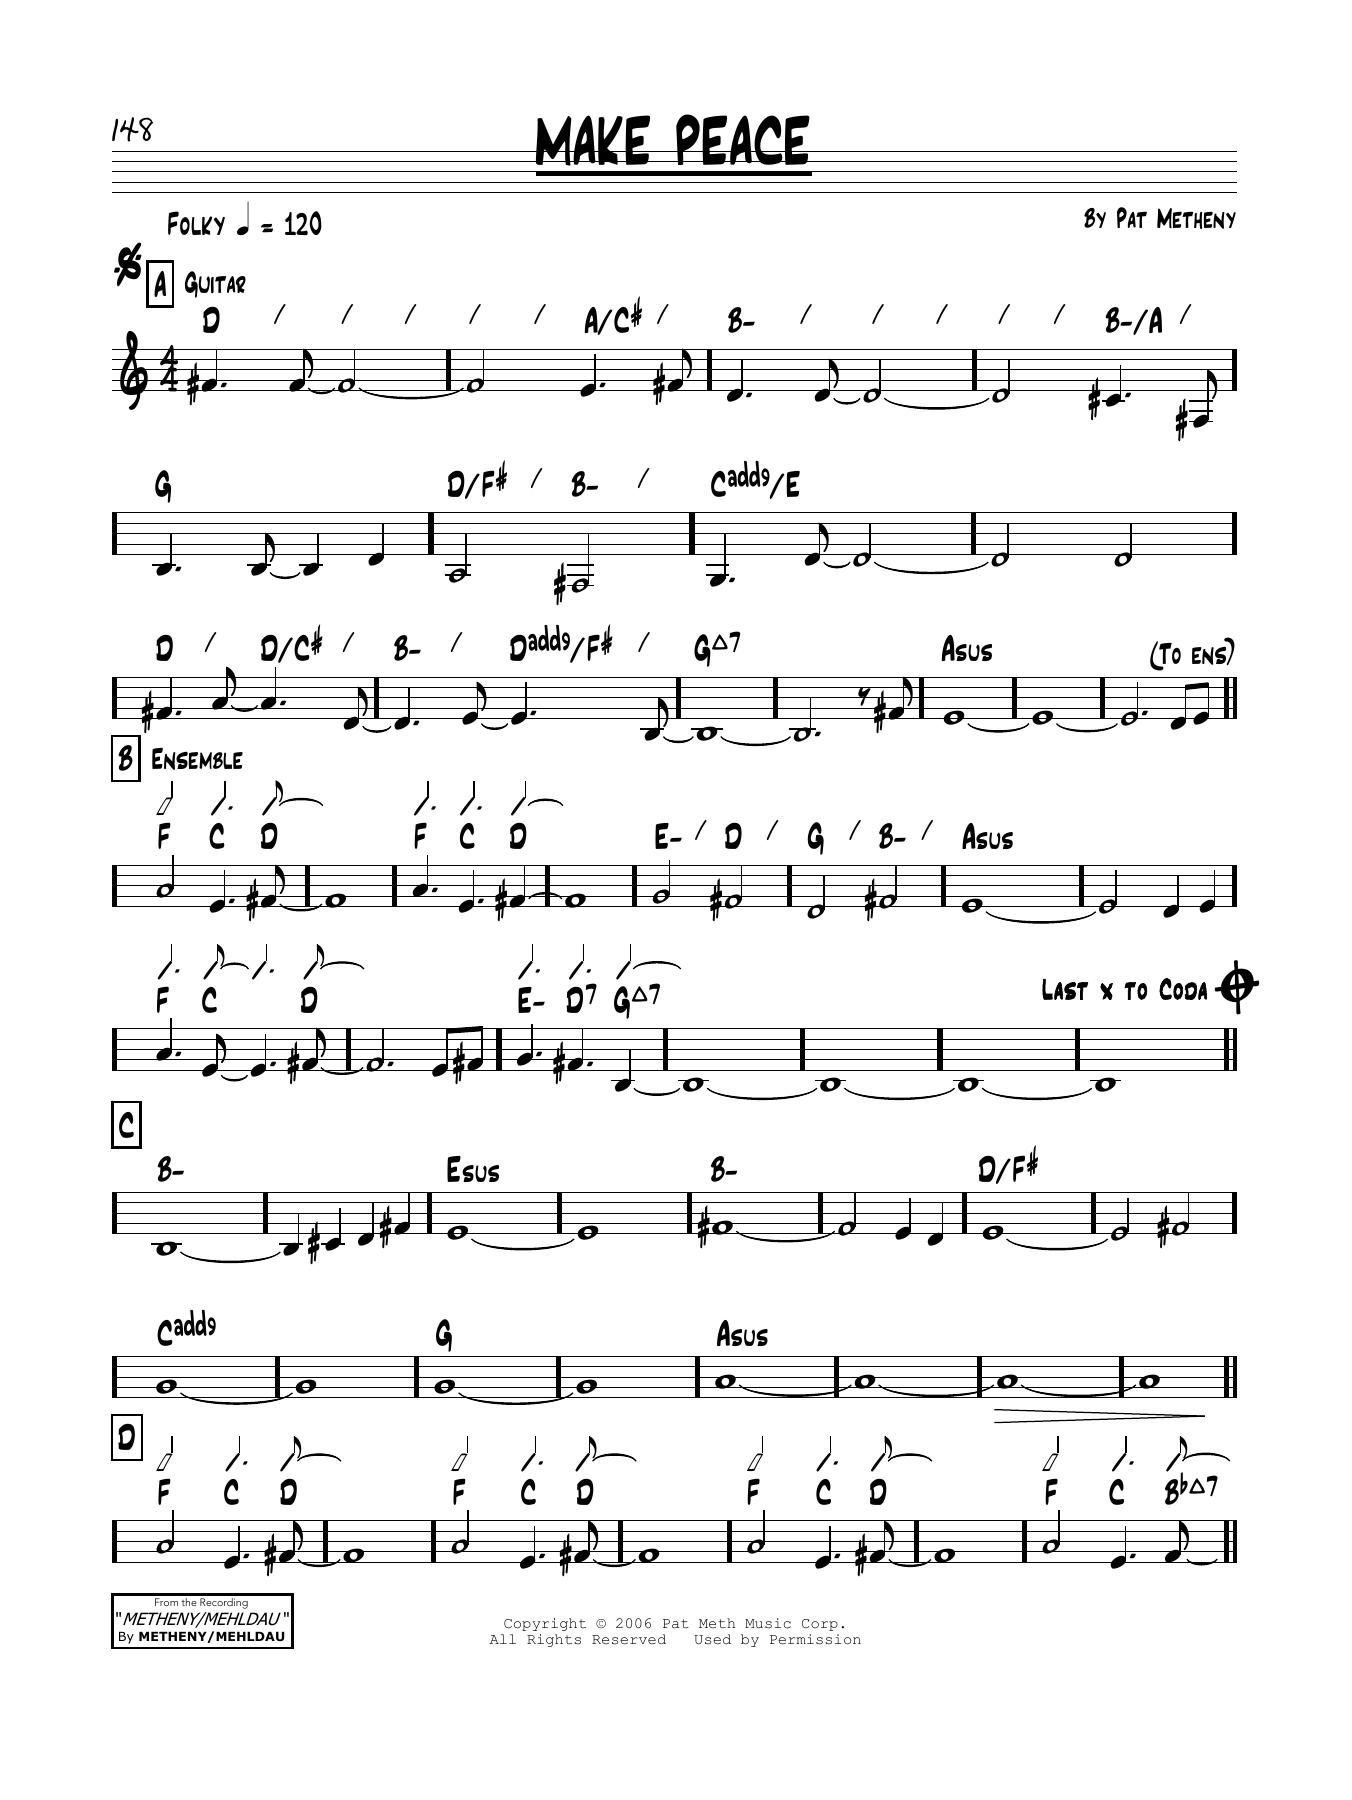 Pat Metheny Make Peace sheet music notes and chords. Download Printable PDF.